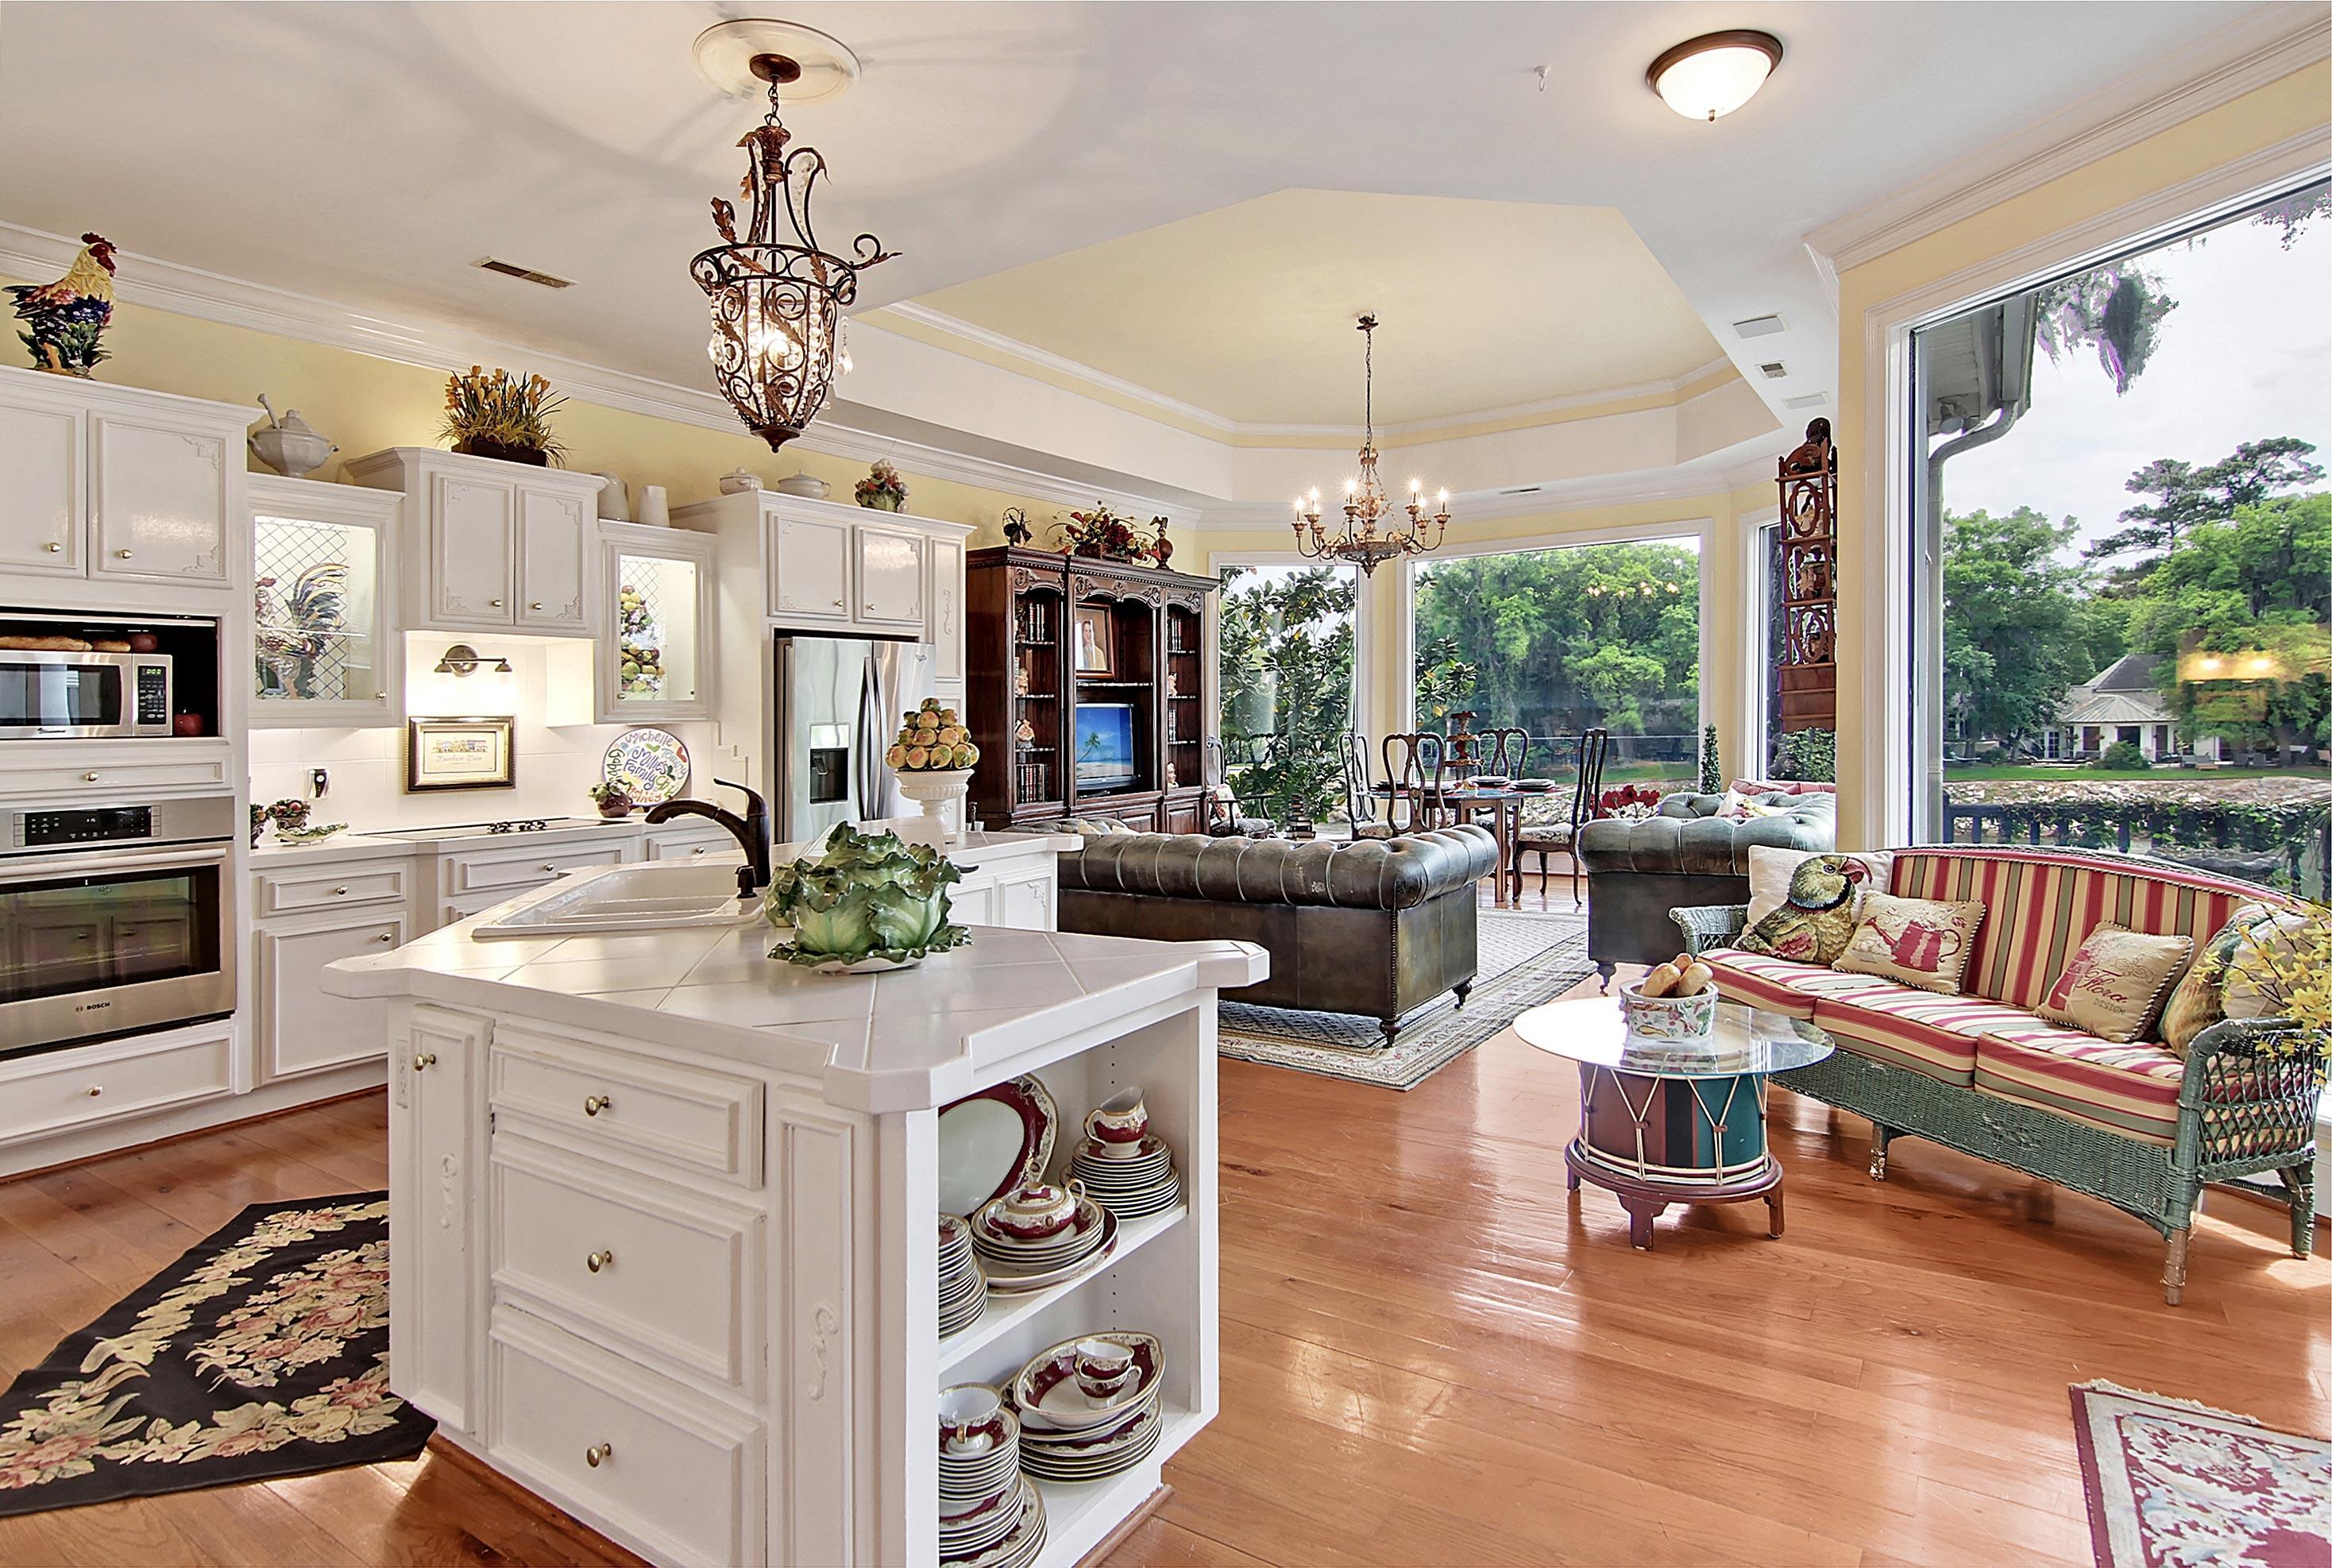 Edgewater Park Homes For Sale - 1323 Edgewater, Charleston, SC - 34